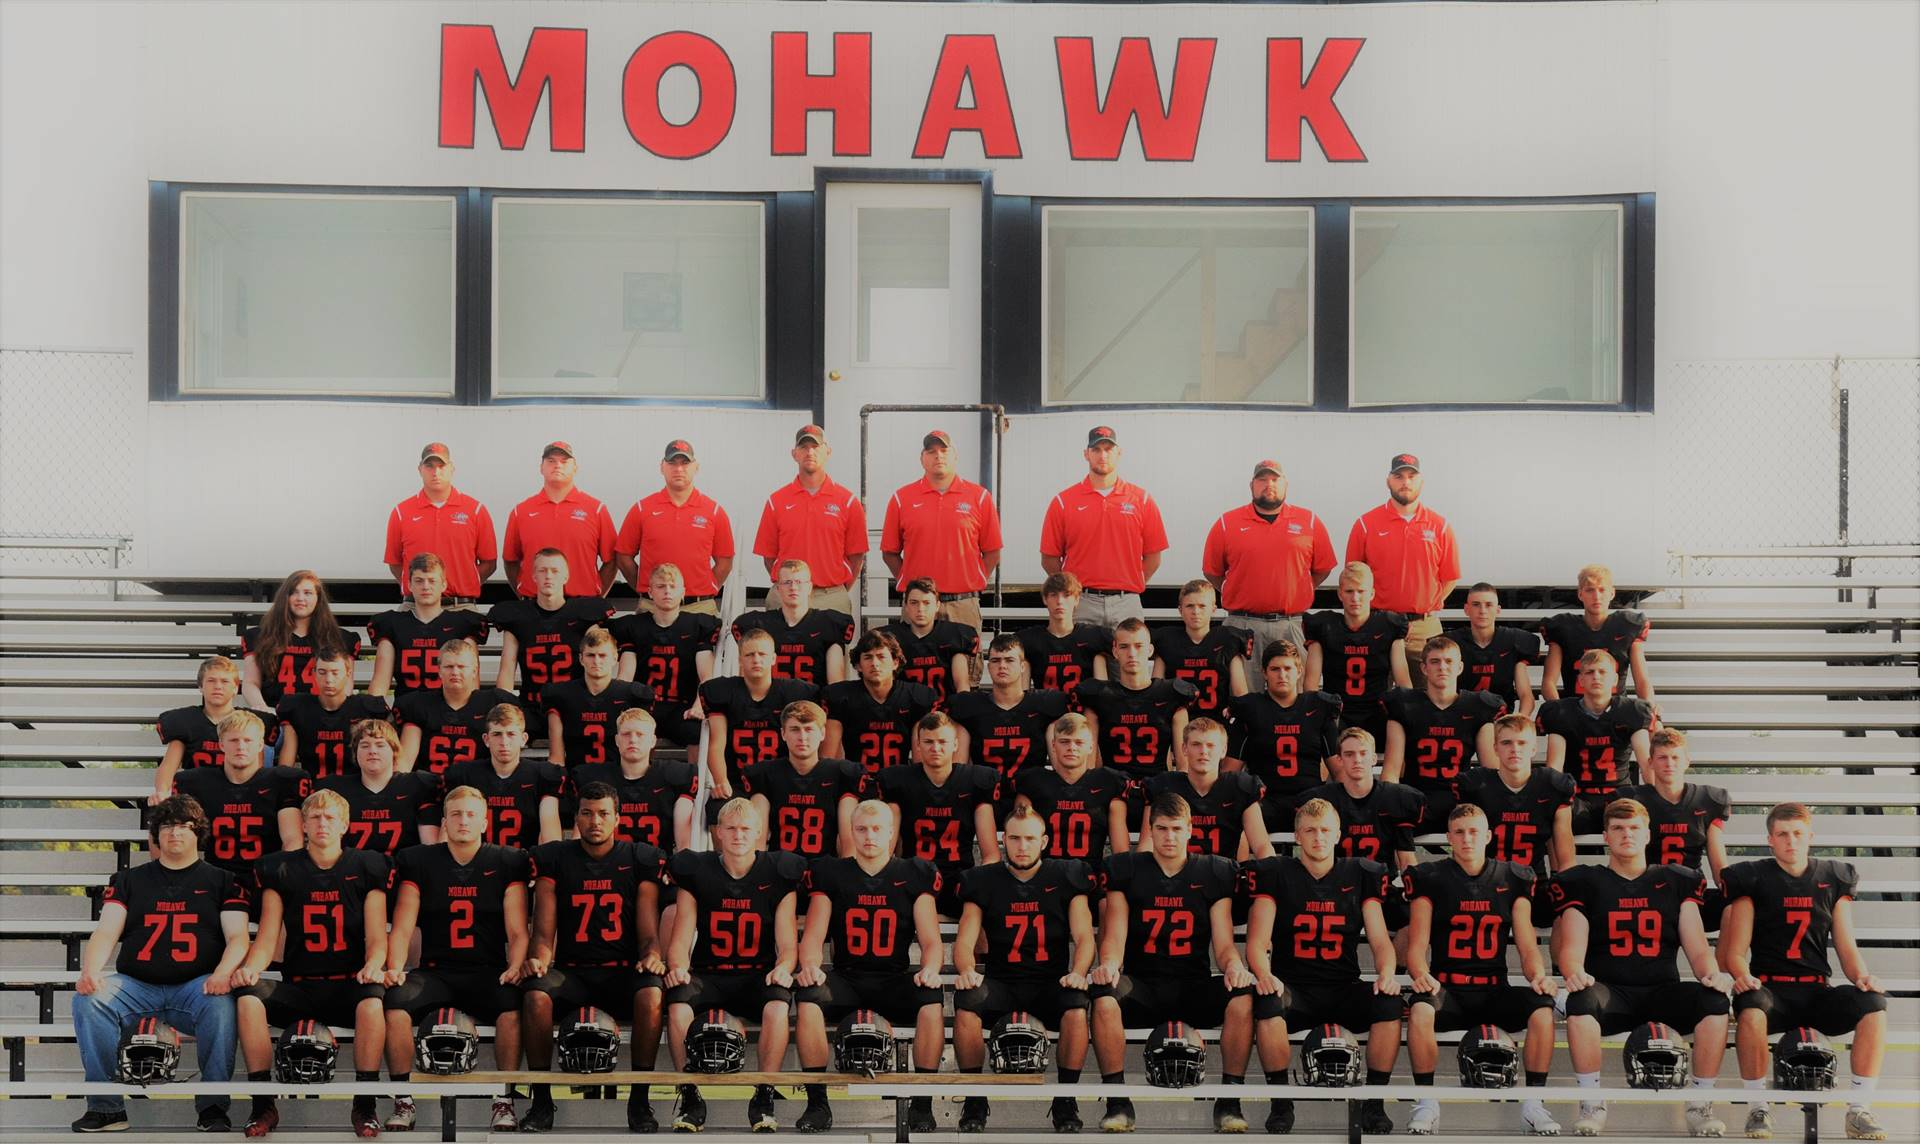 2018 Mohawk Football